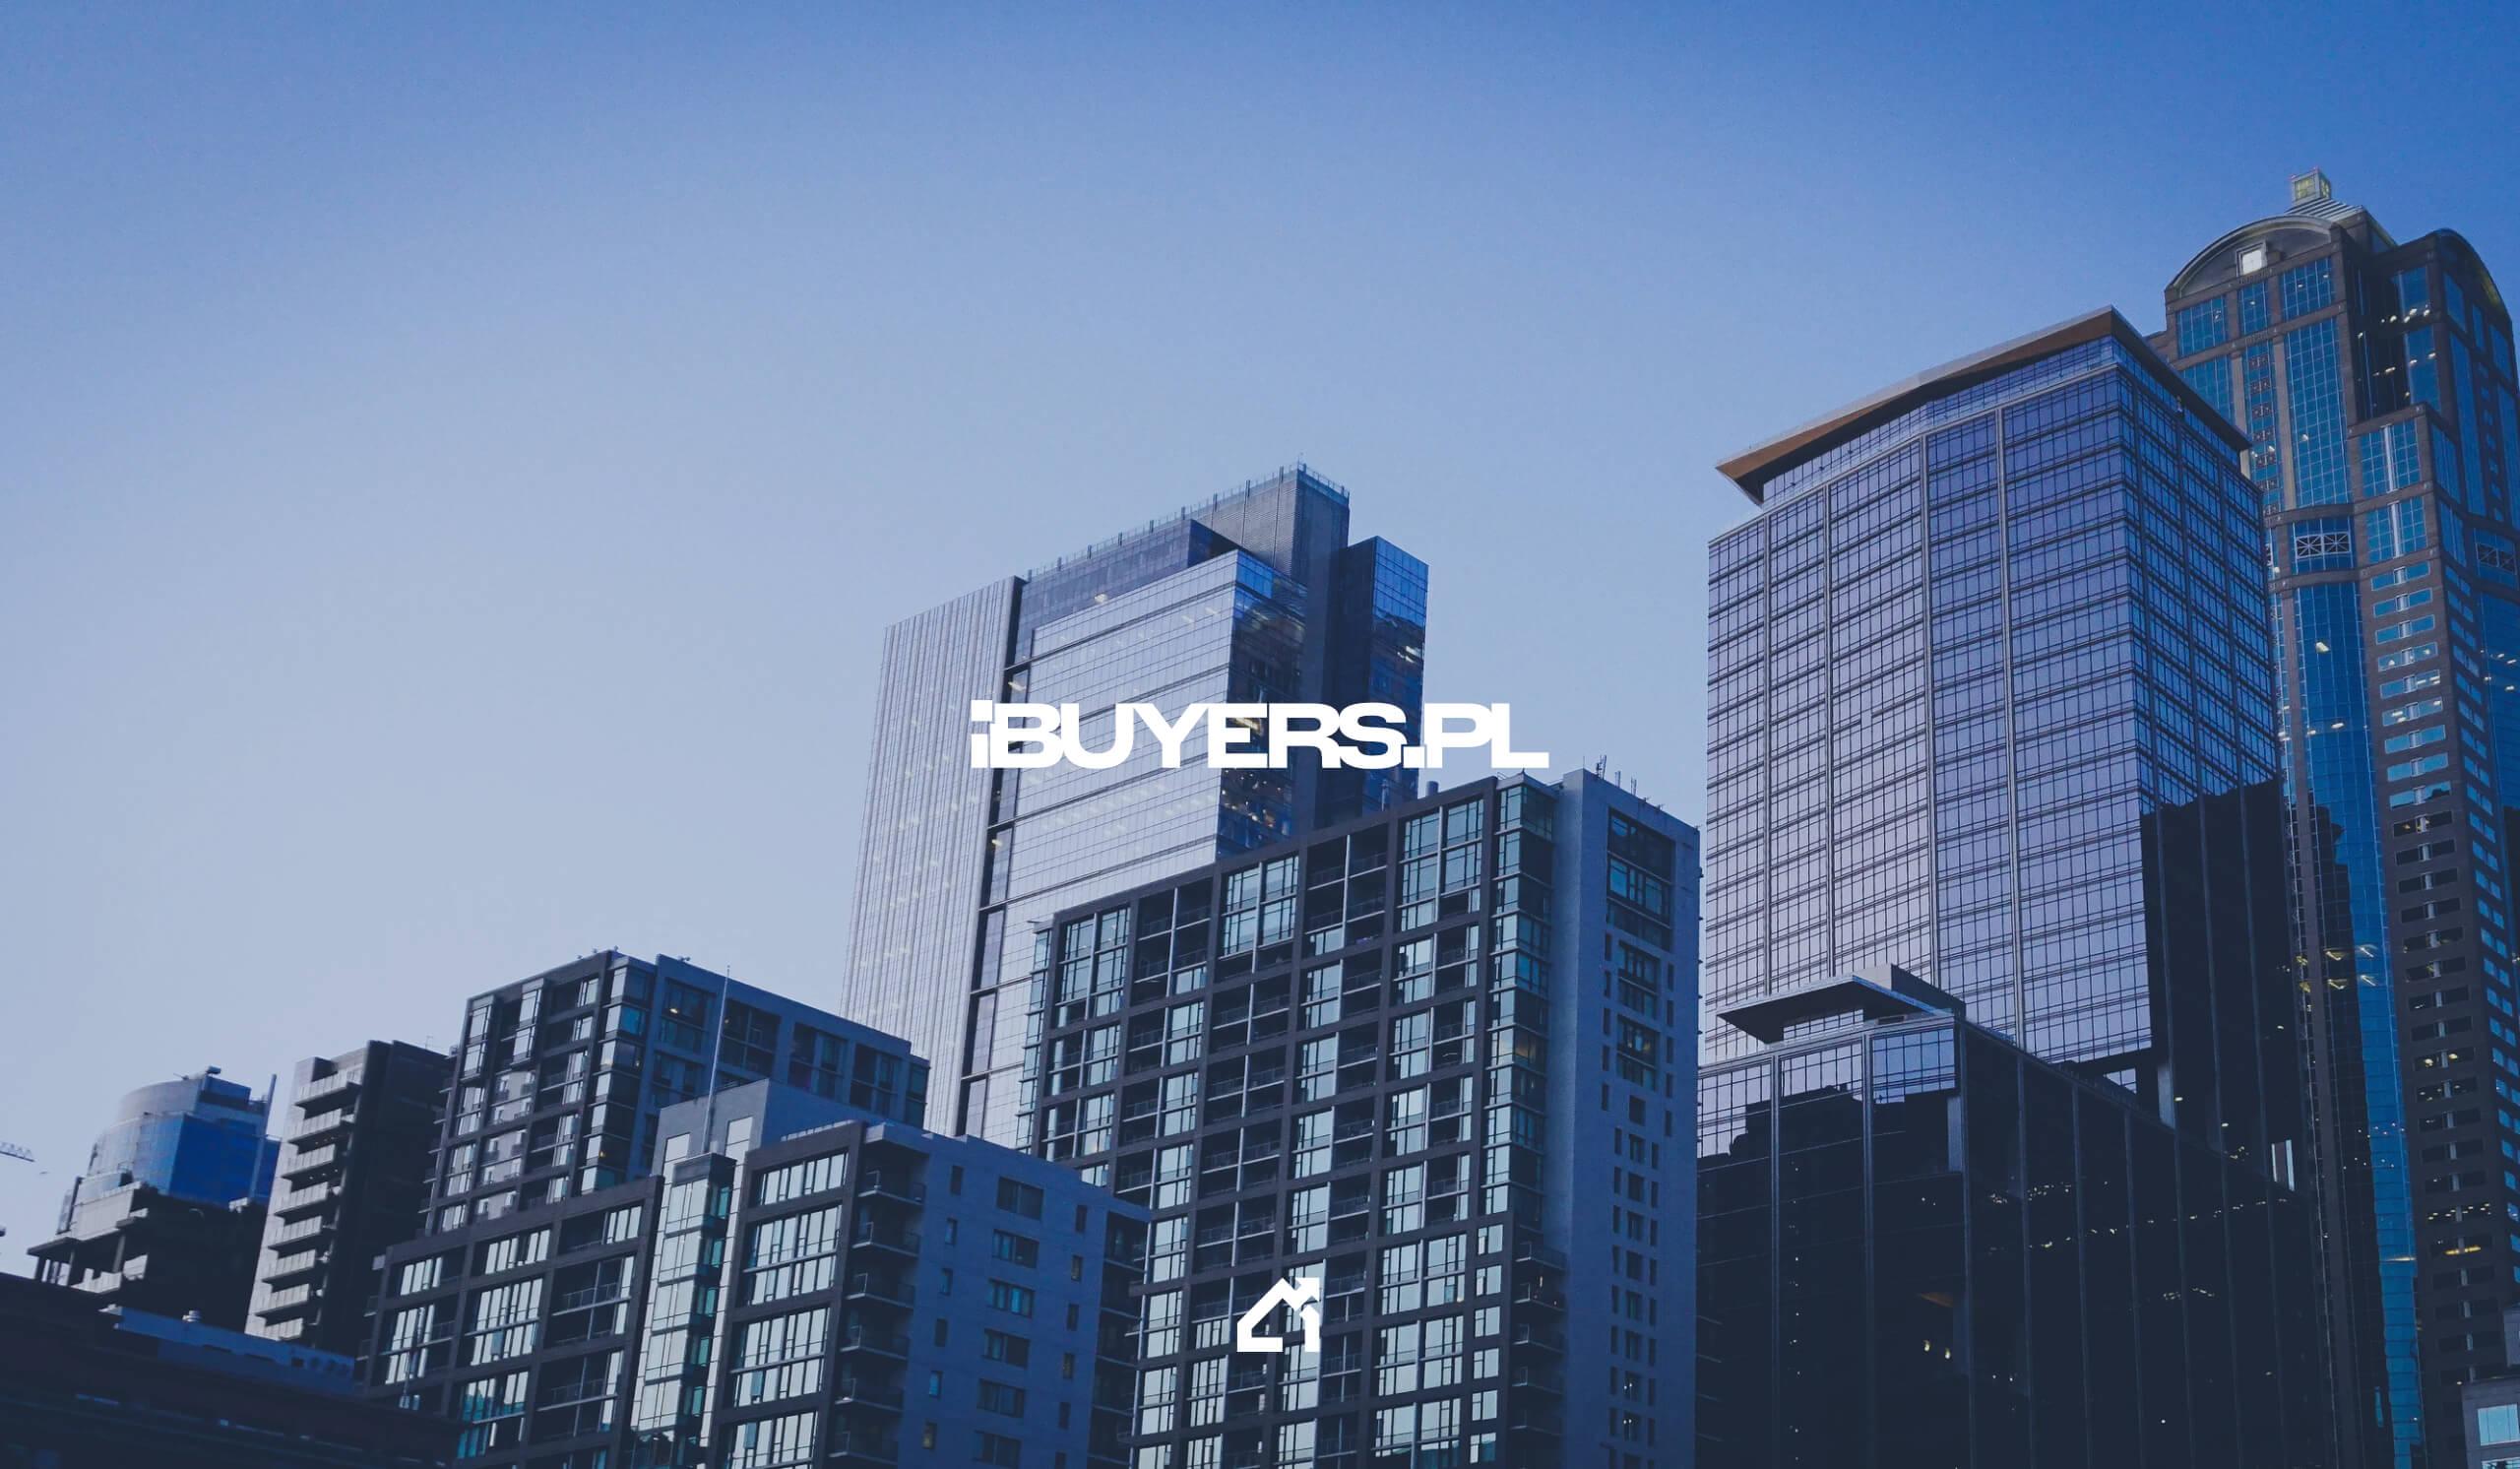 ibuyers.pl - Branding & Web App Development